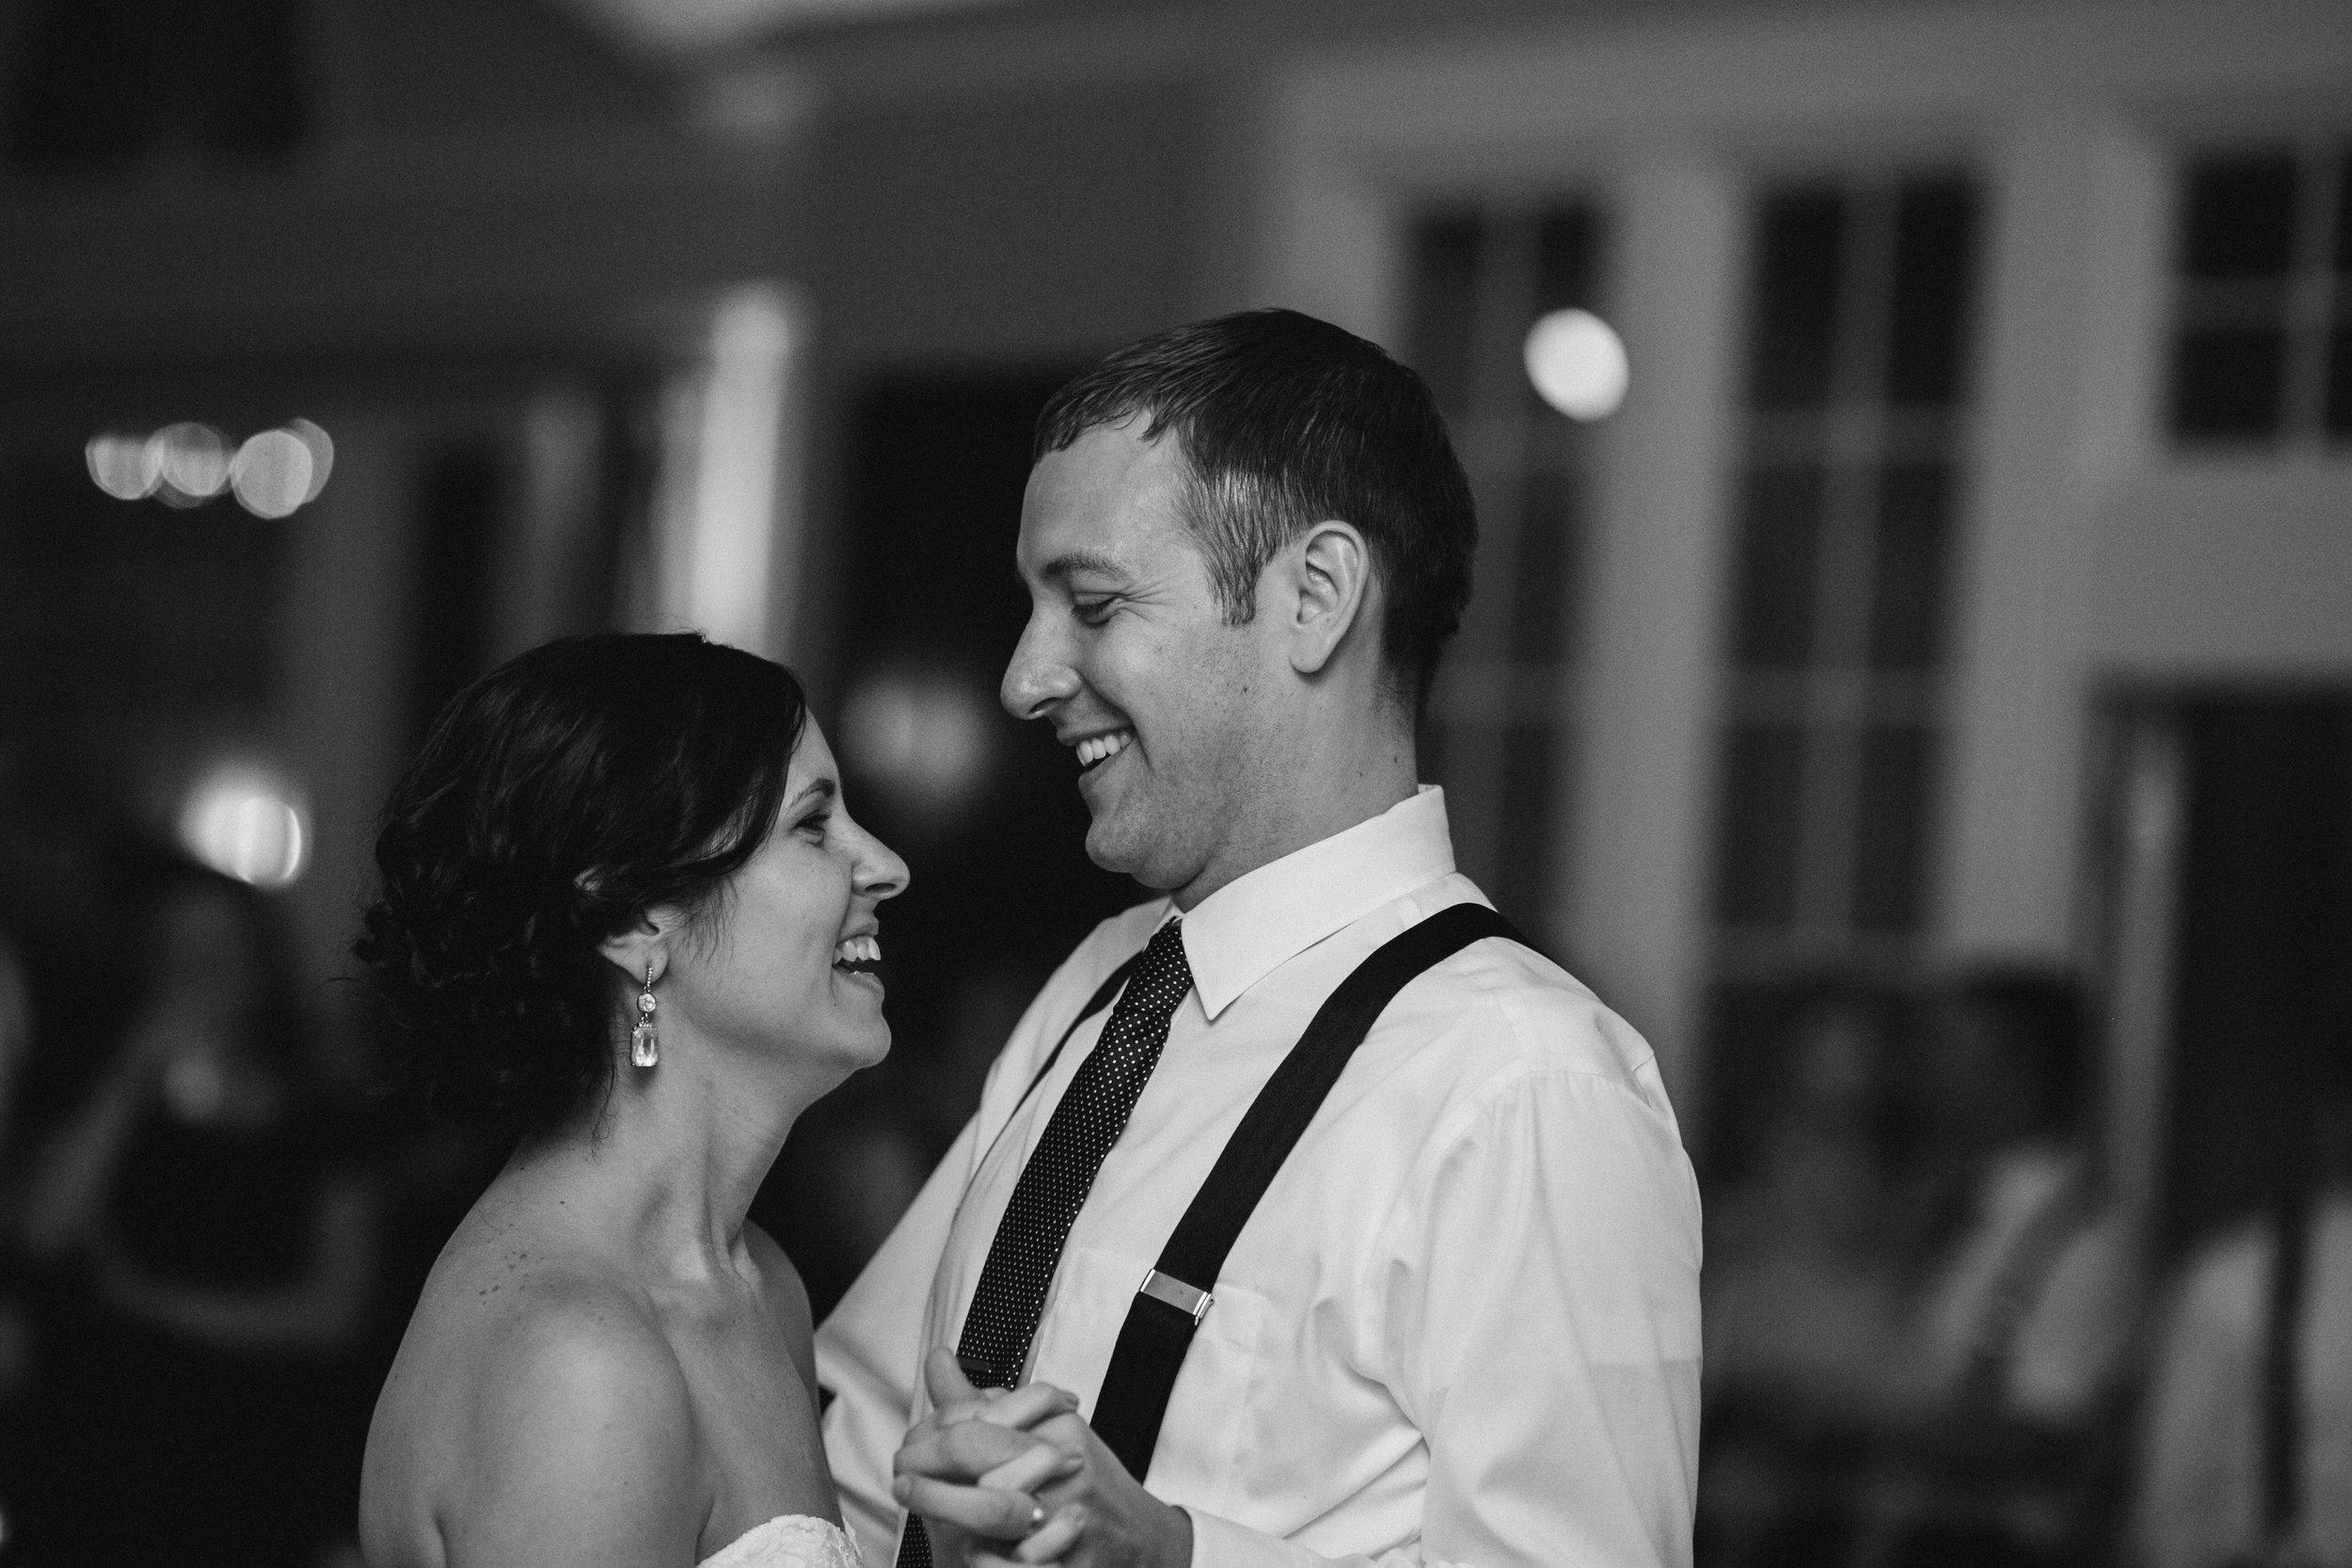 wisconsin-wedding-acowsay-uttke-photography-63.jpg